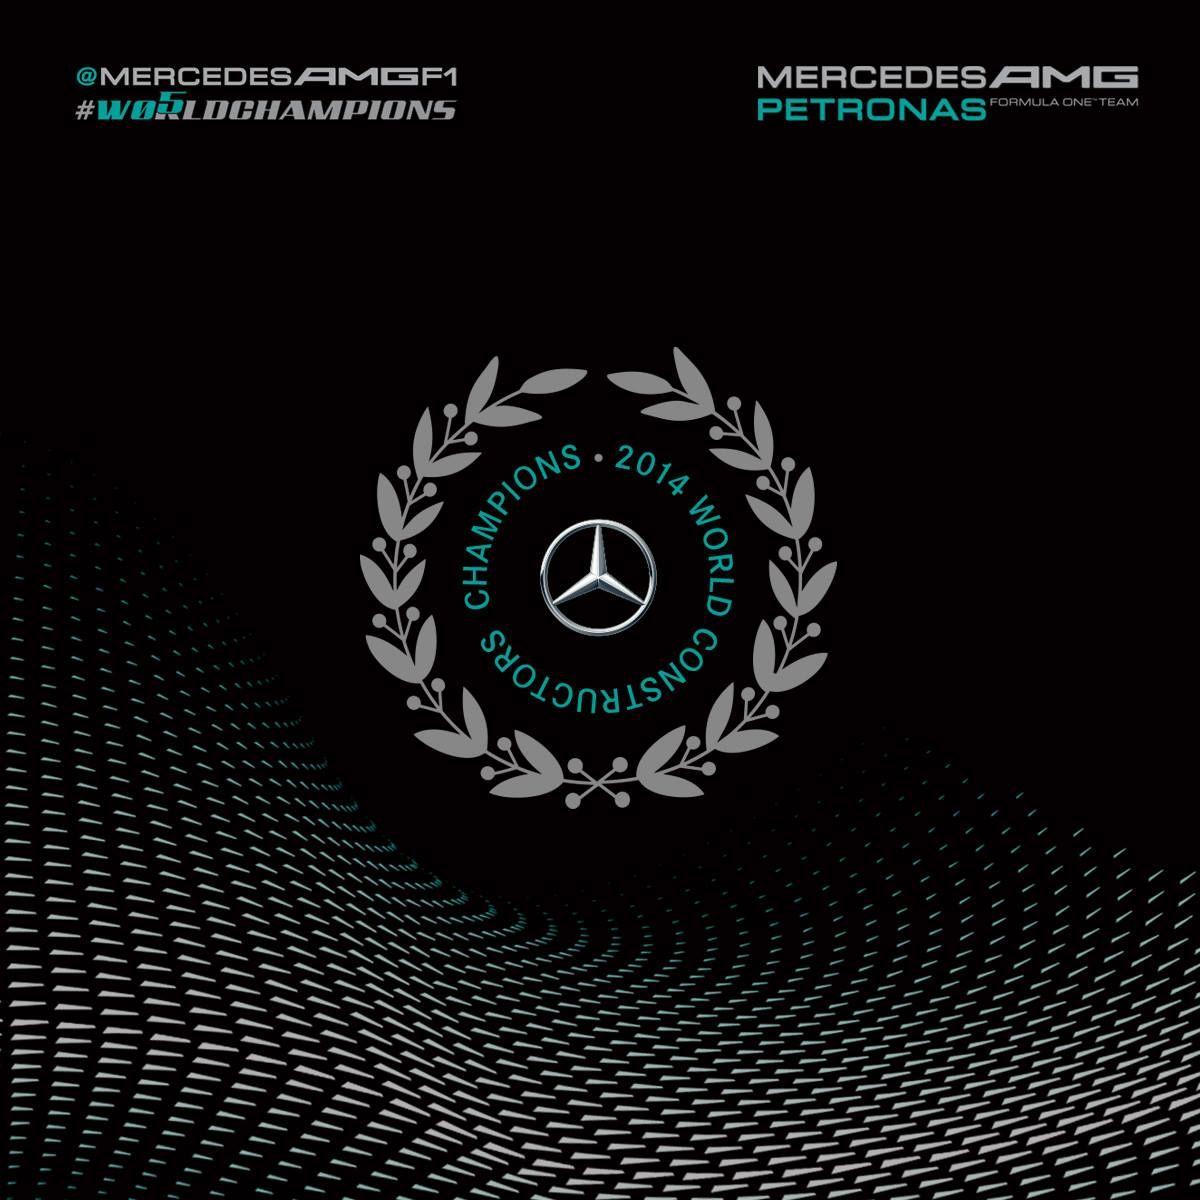 mercedes amg petronas f1 team 2014 world constructors. Black Bedroom Furniture Sets. Home Design Ideas